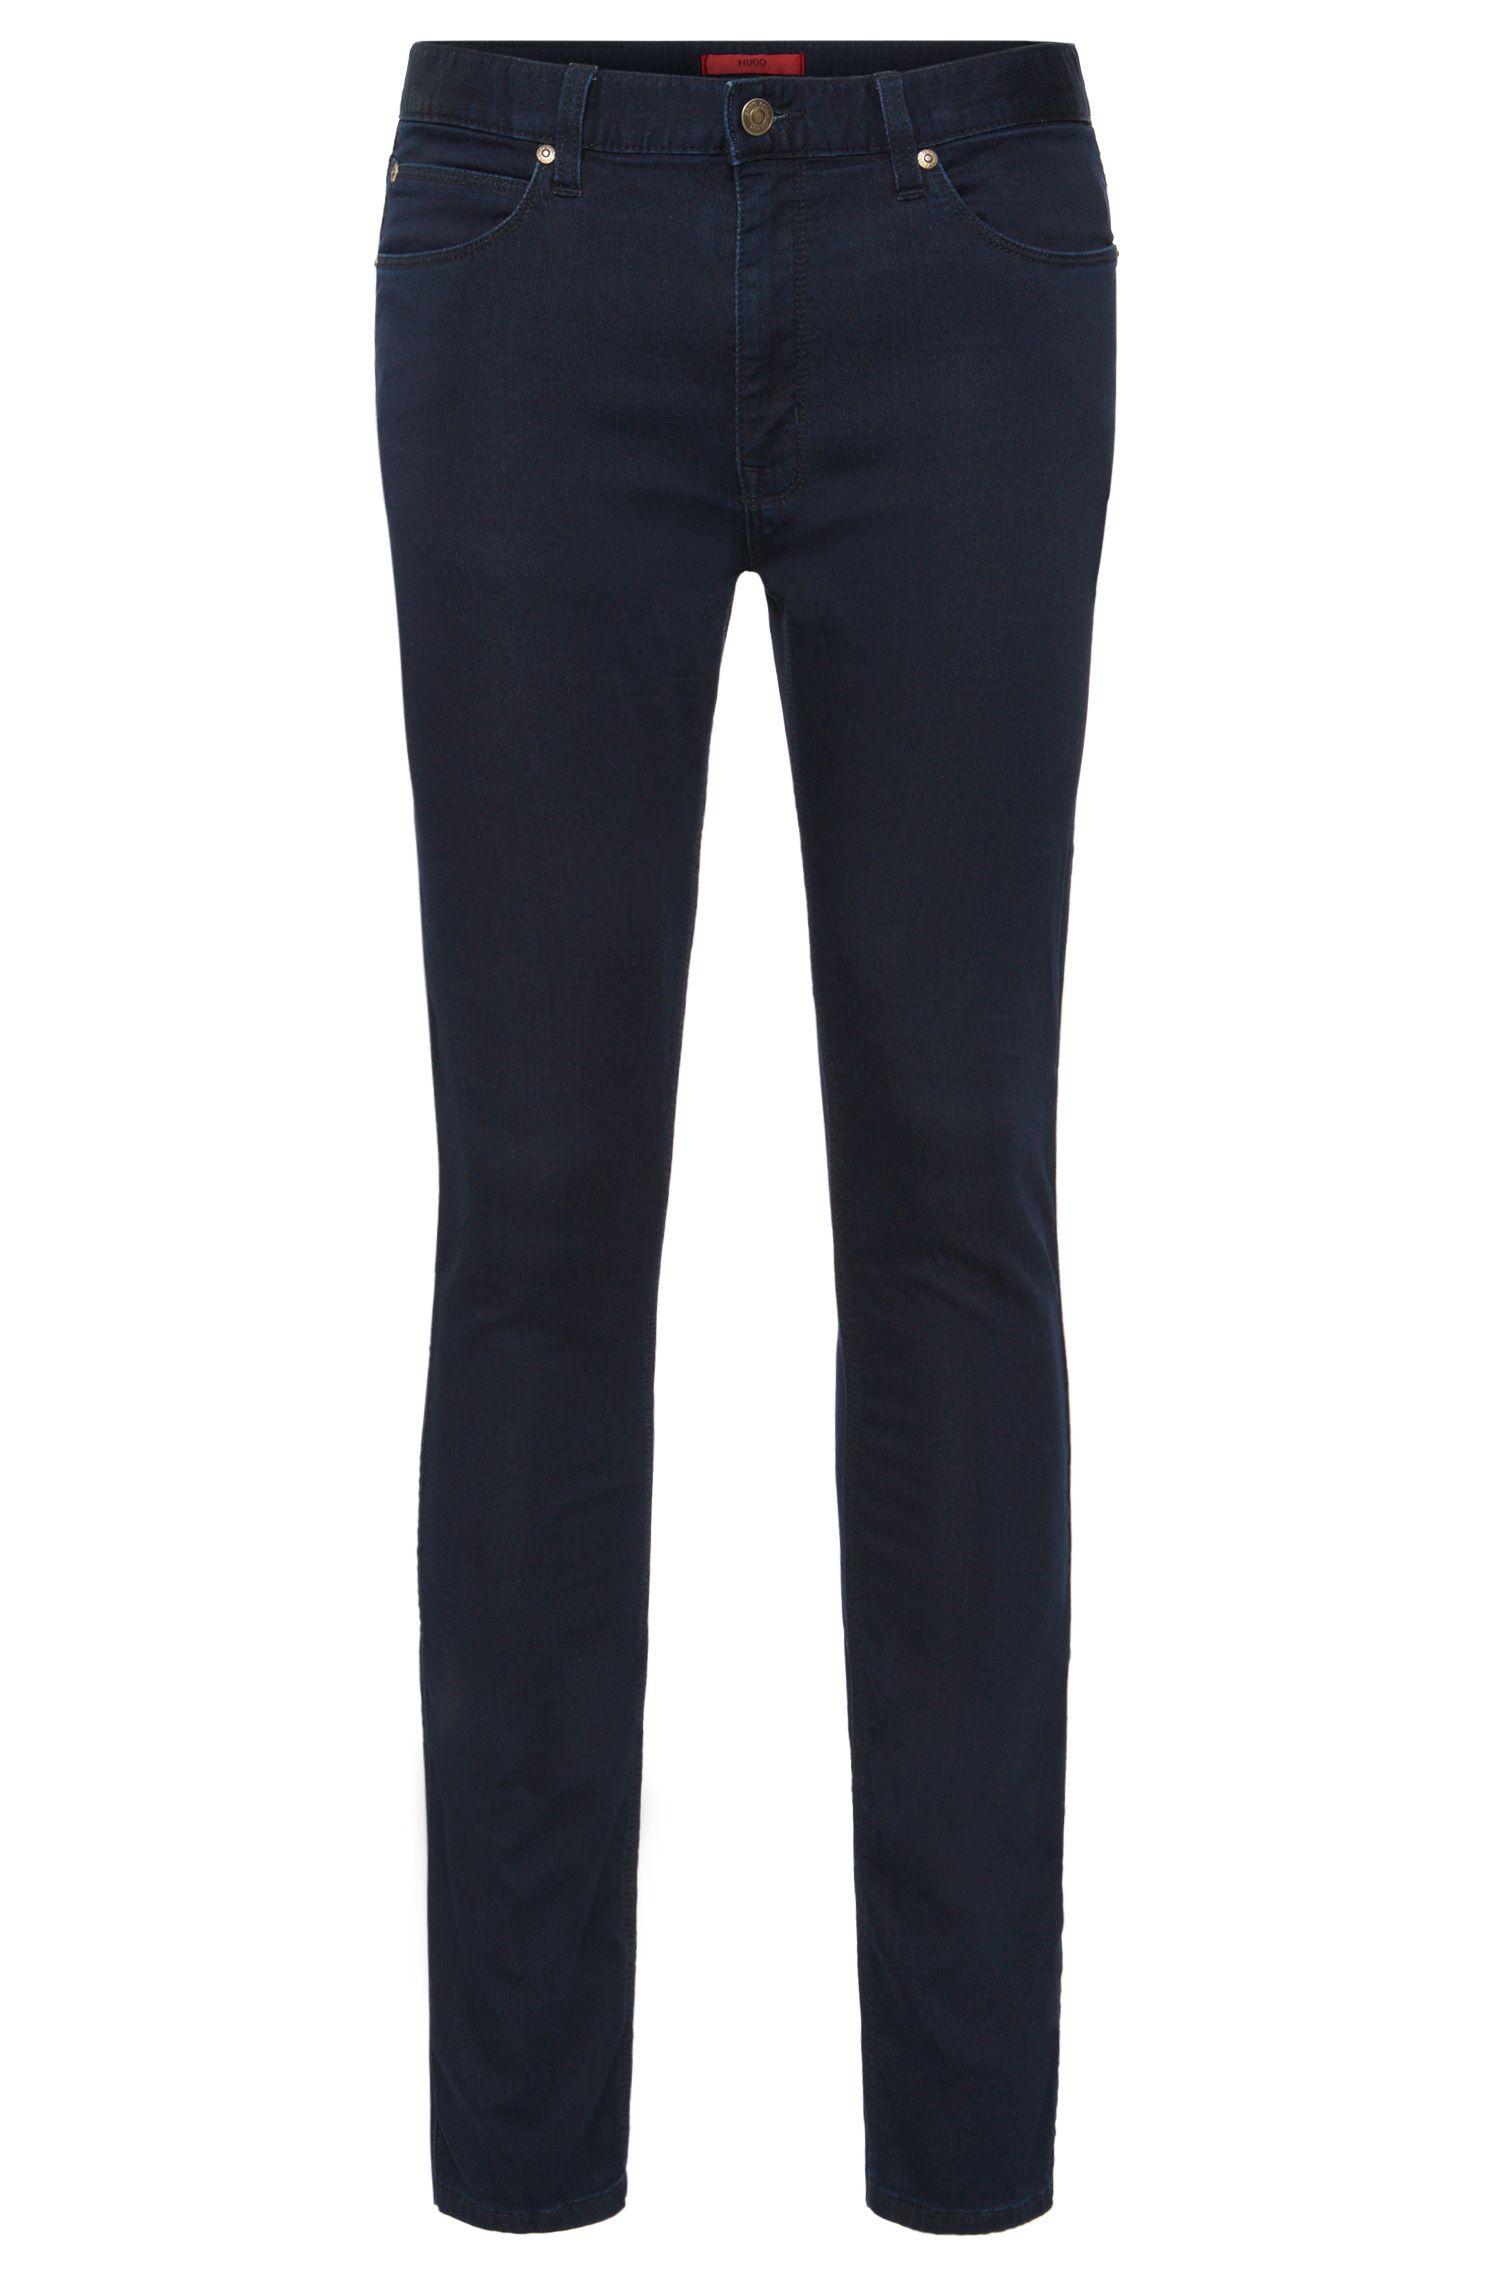 'HUGO 734' | Skinny Fit, 8.5 oz Stretch Cotton Blend Jeans